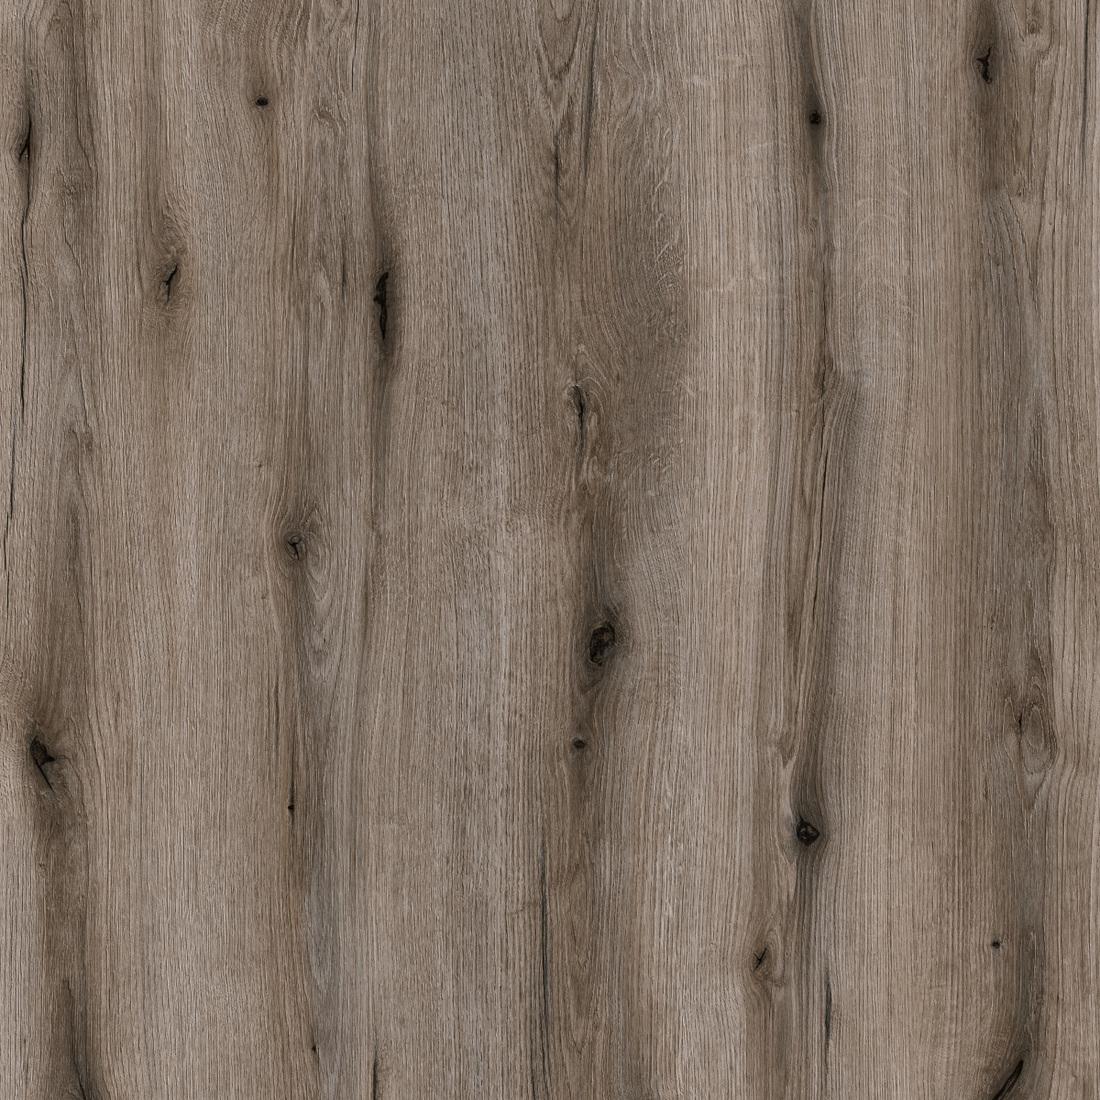 Pal melaminat Kronospan, Stejar fosil K366 PW, 2800 x 2070 x 18 mm imagine MatHaus.ro